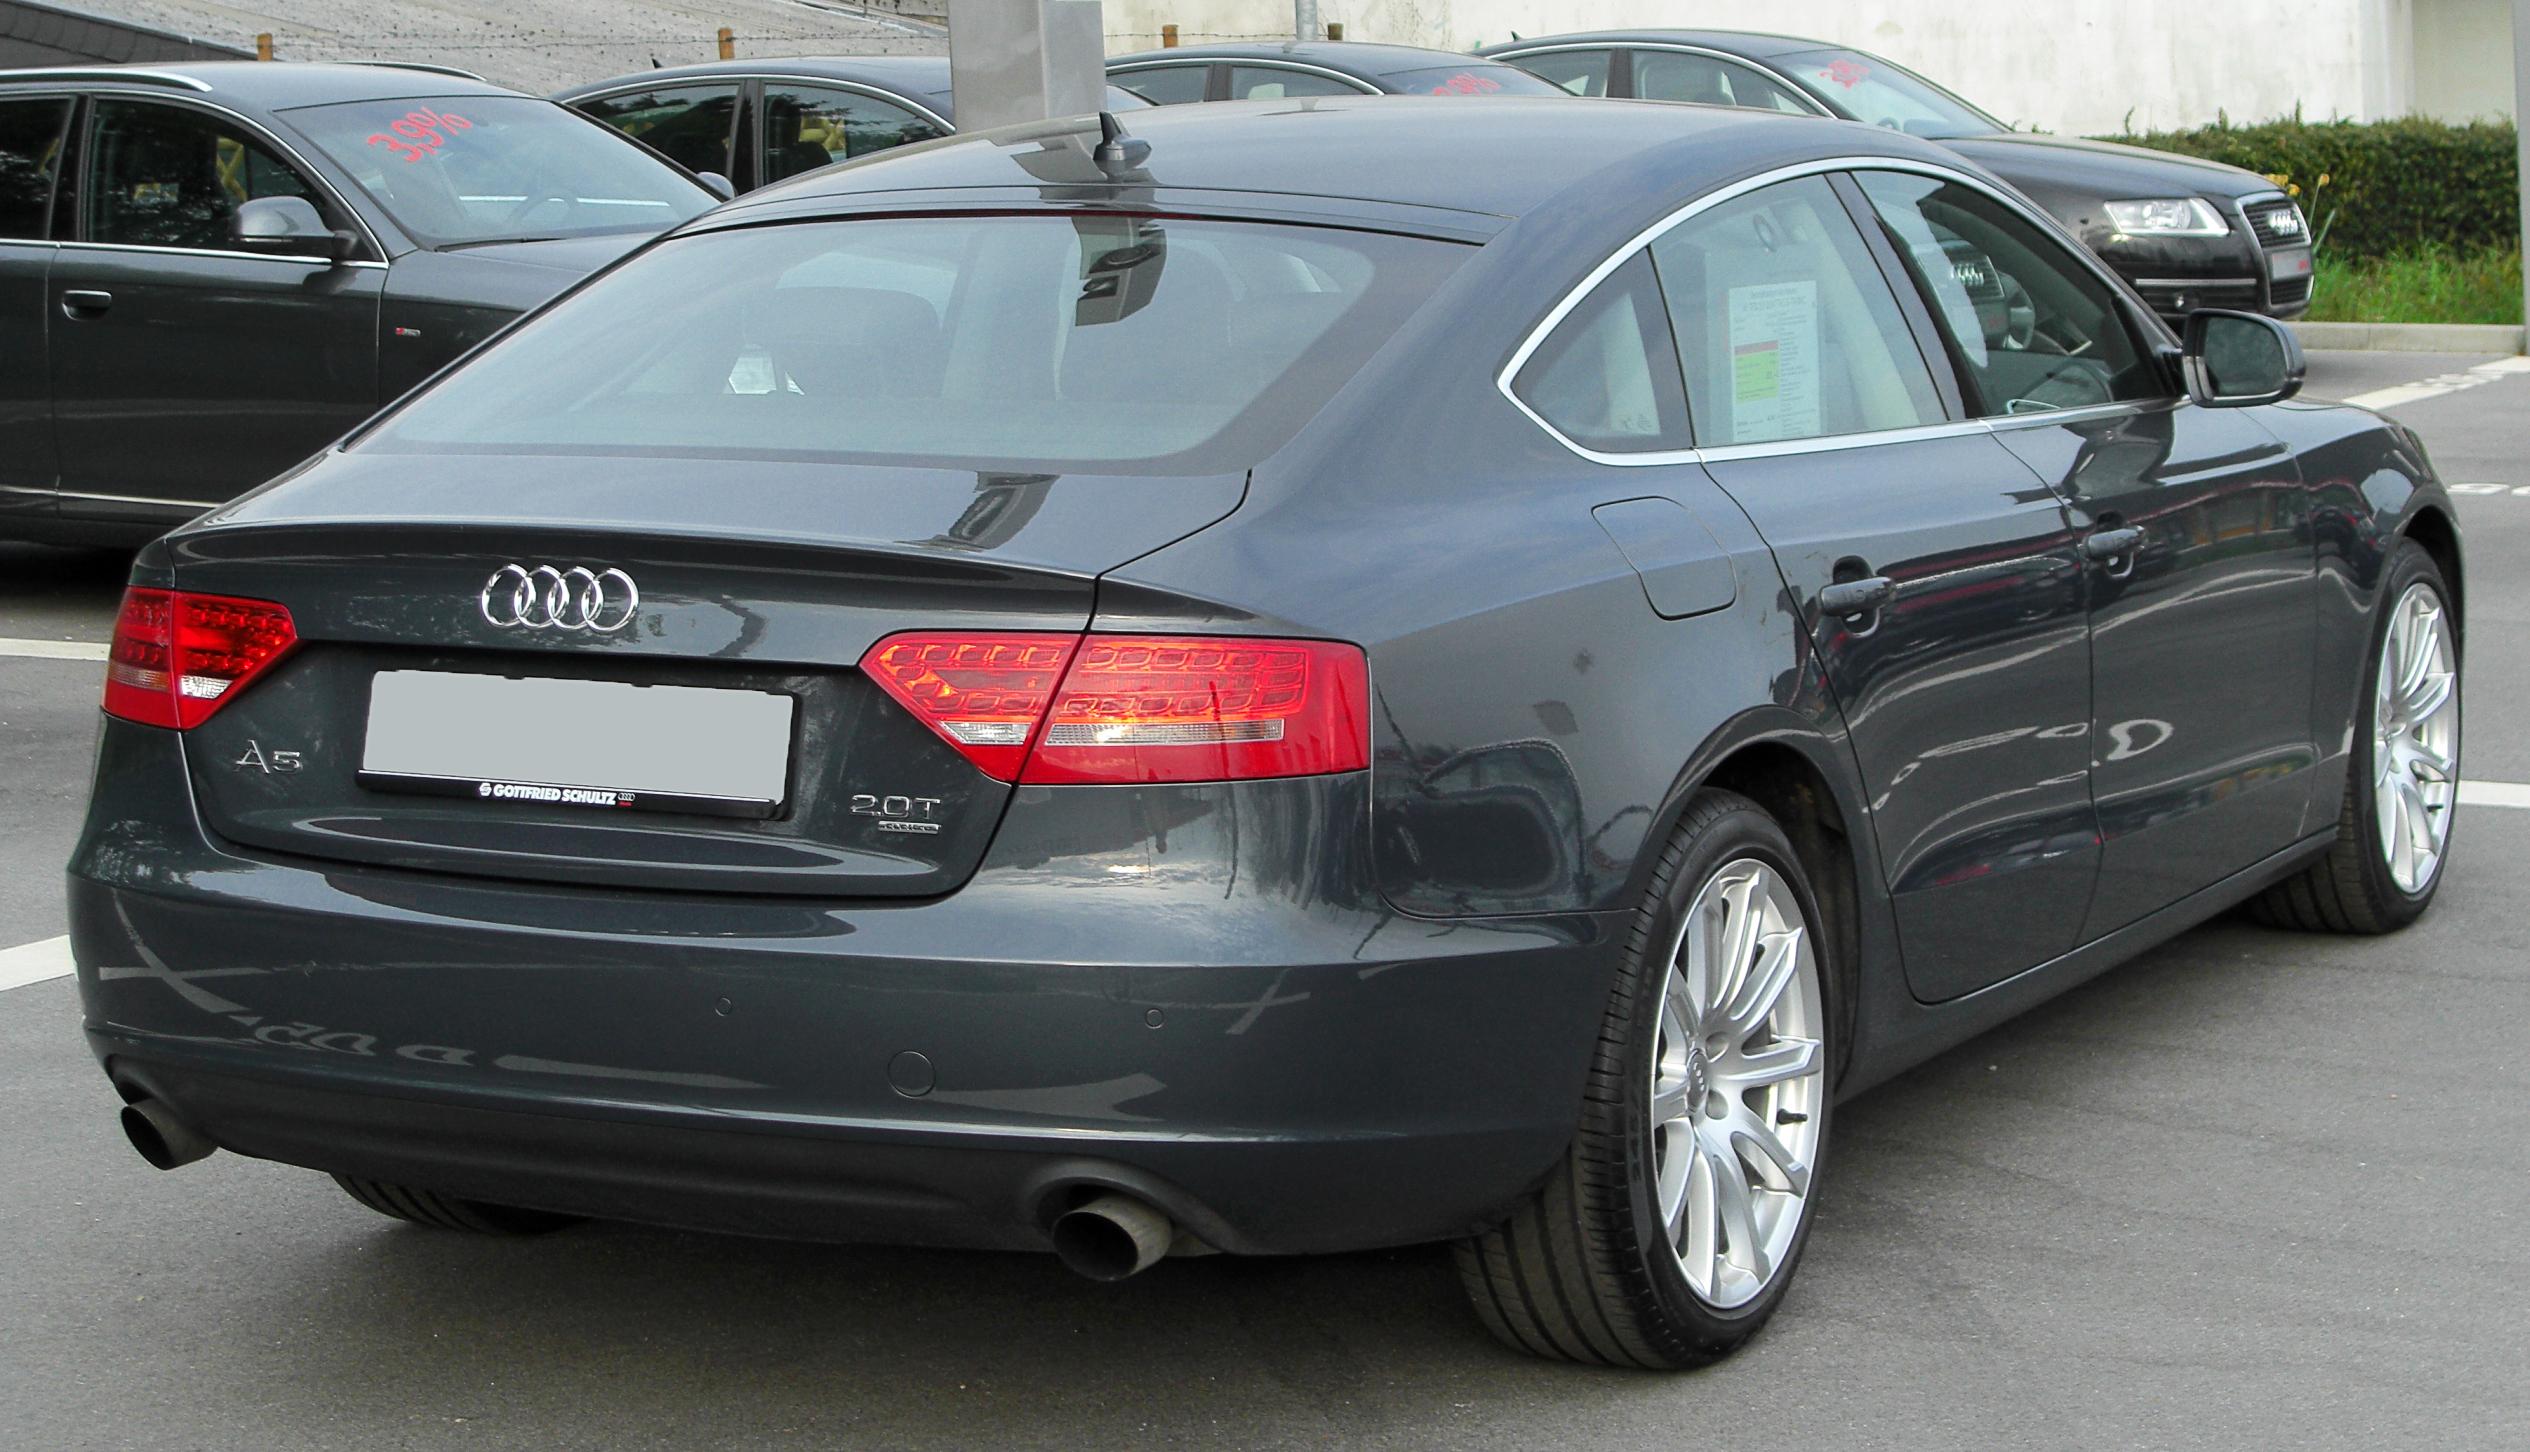 http://upload.wikimedia.org/wikipedia/commons/c/c0/Audi_A5_Sportback_2.0_TFSI_quattro_rear_20100425.jpg